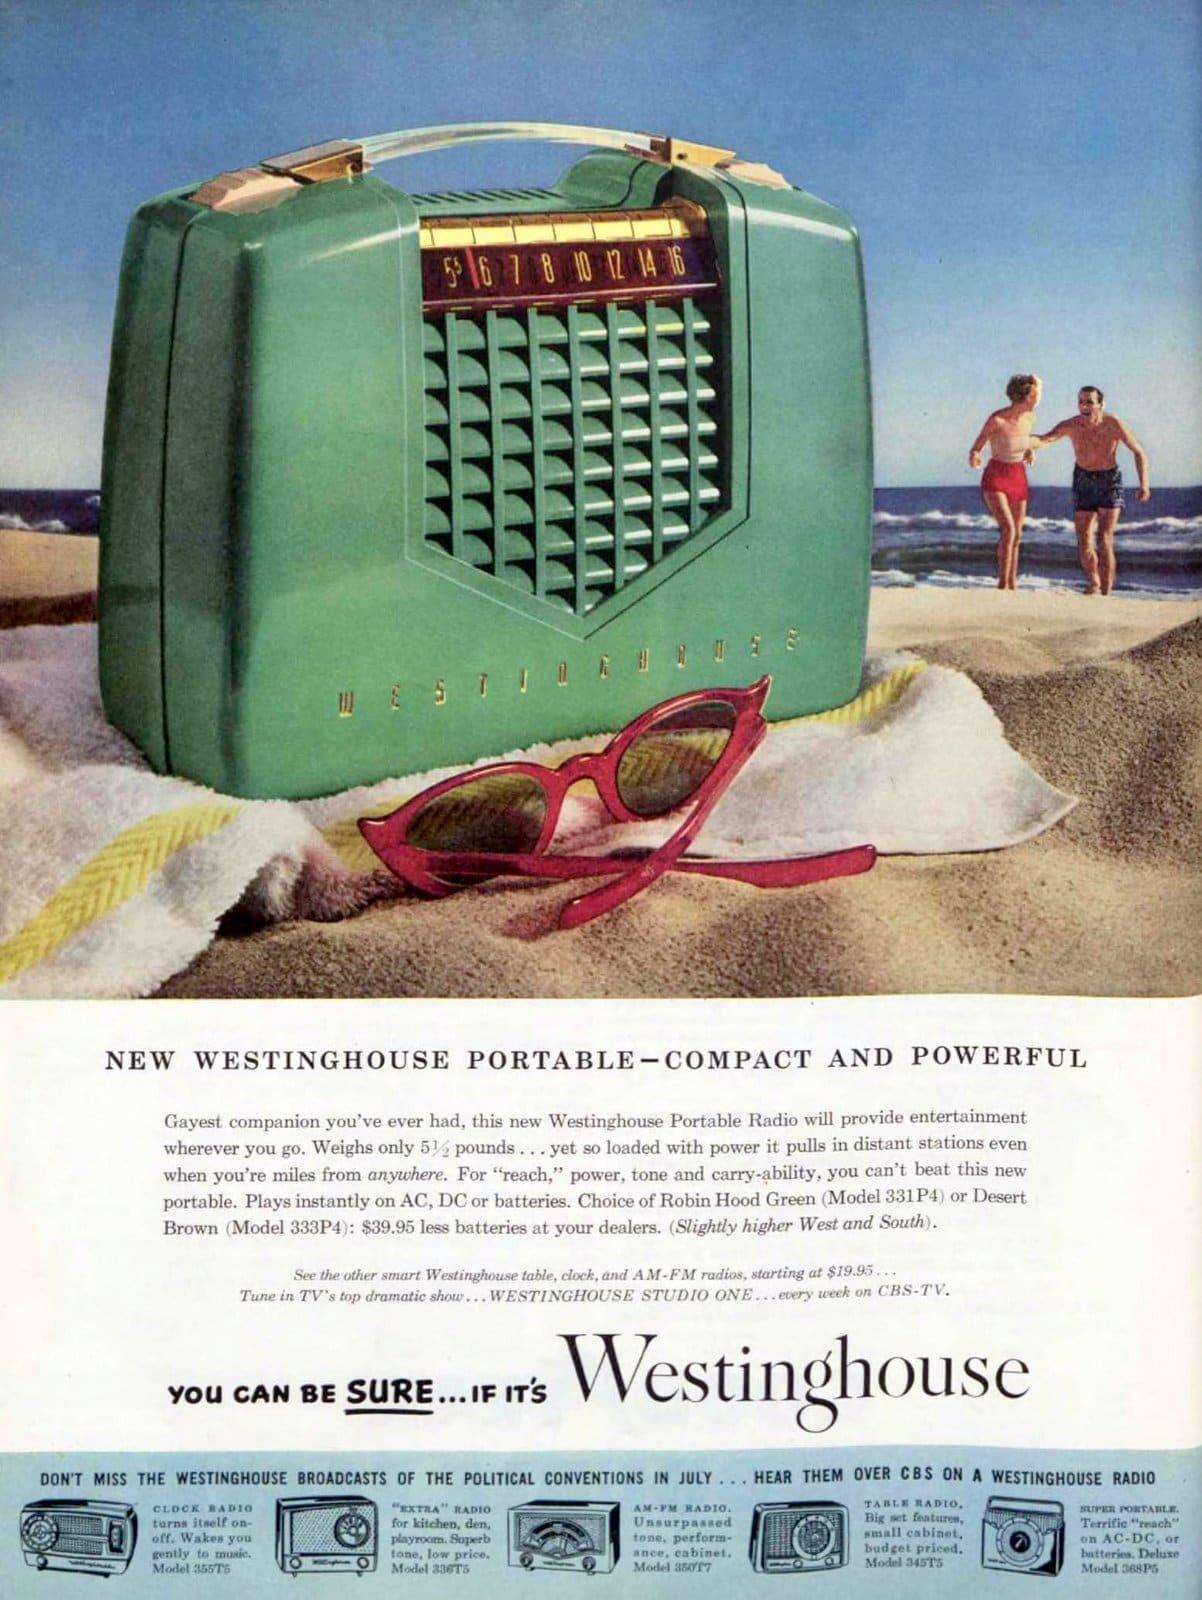 Vintage green Westinghouse portable radio (1952)